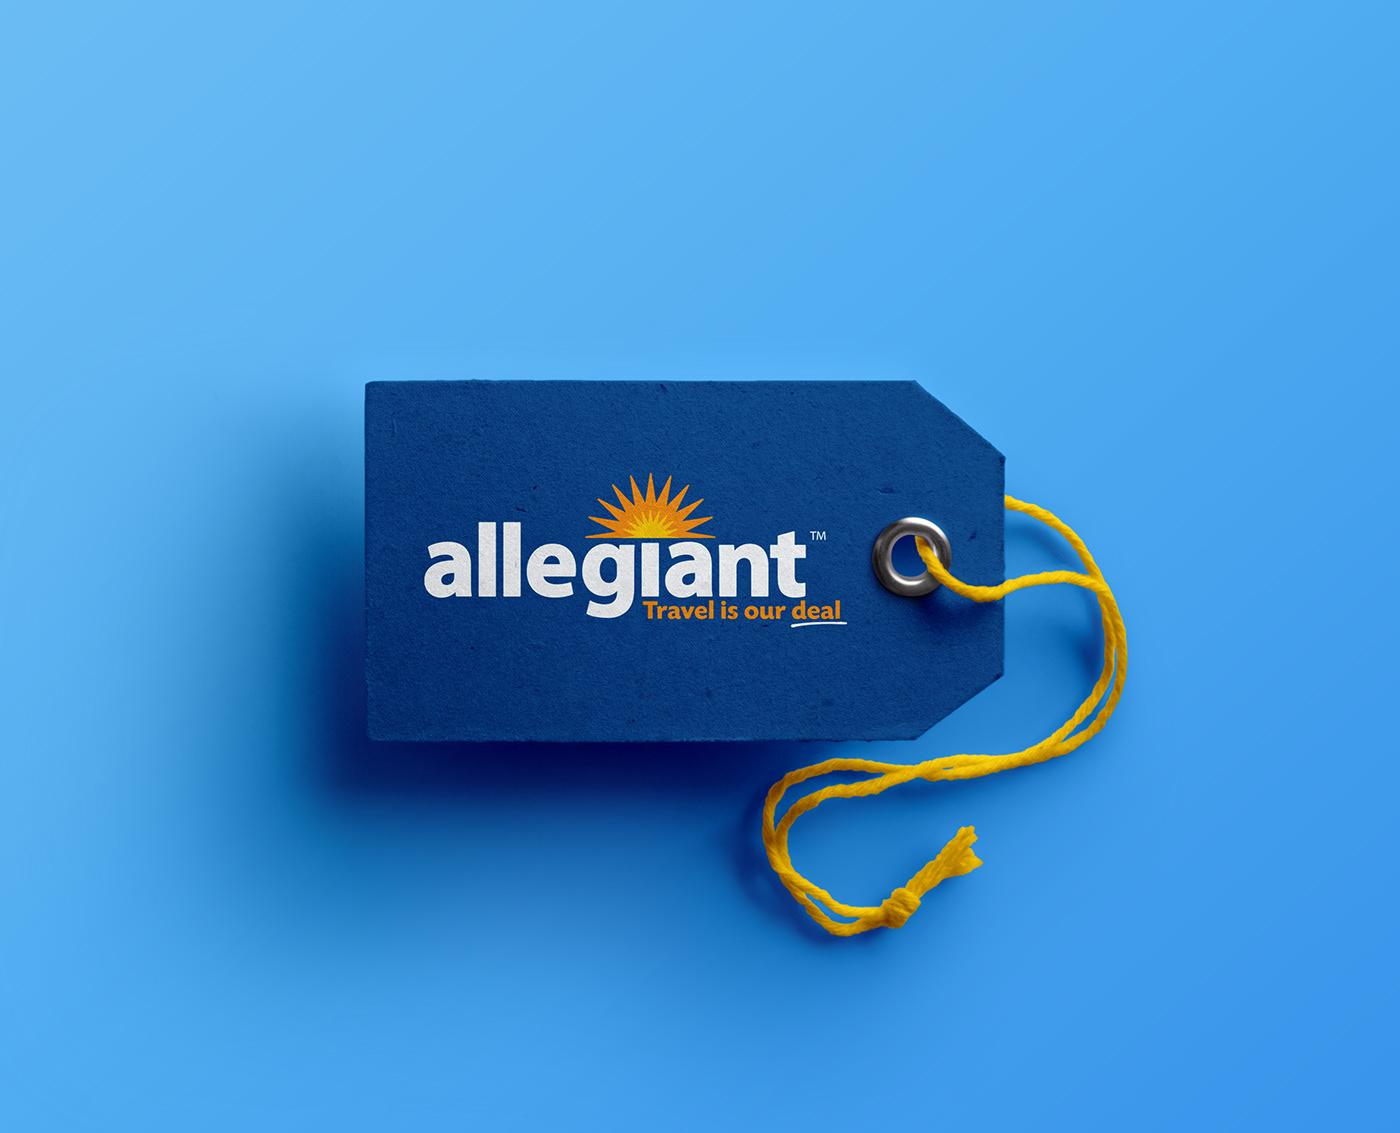 Allegiant Airlines airline airplane Travel flight design logo branding  Identity Design Rebrand